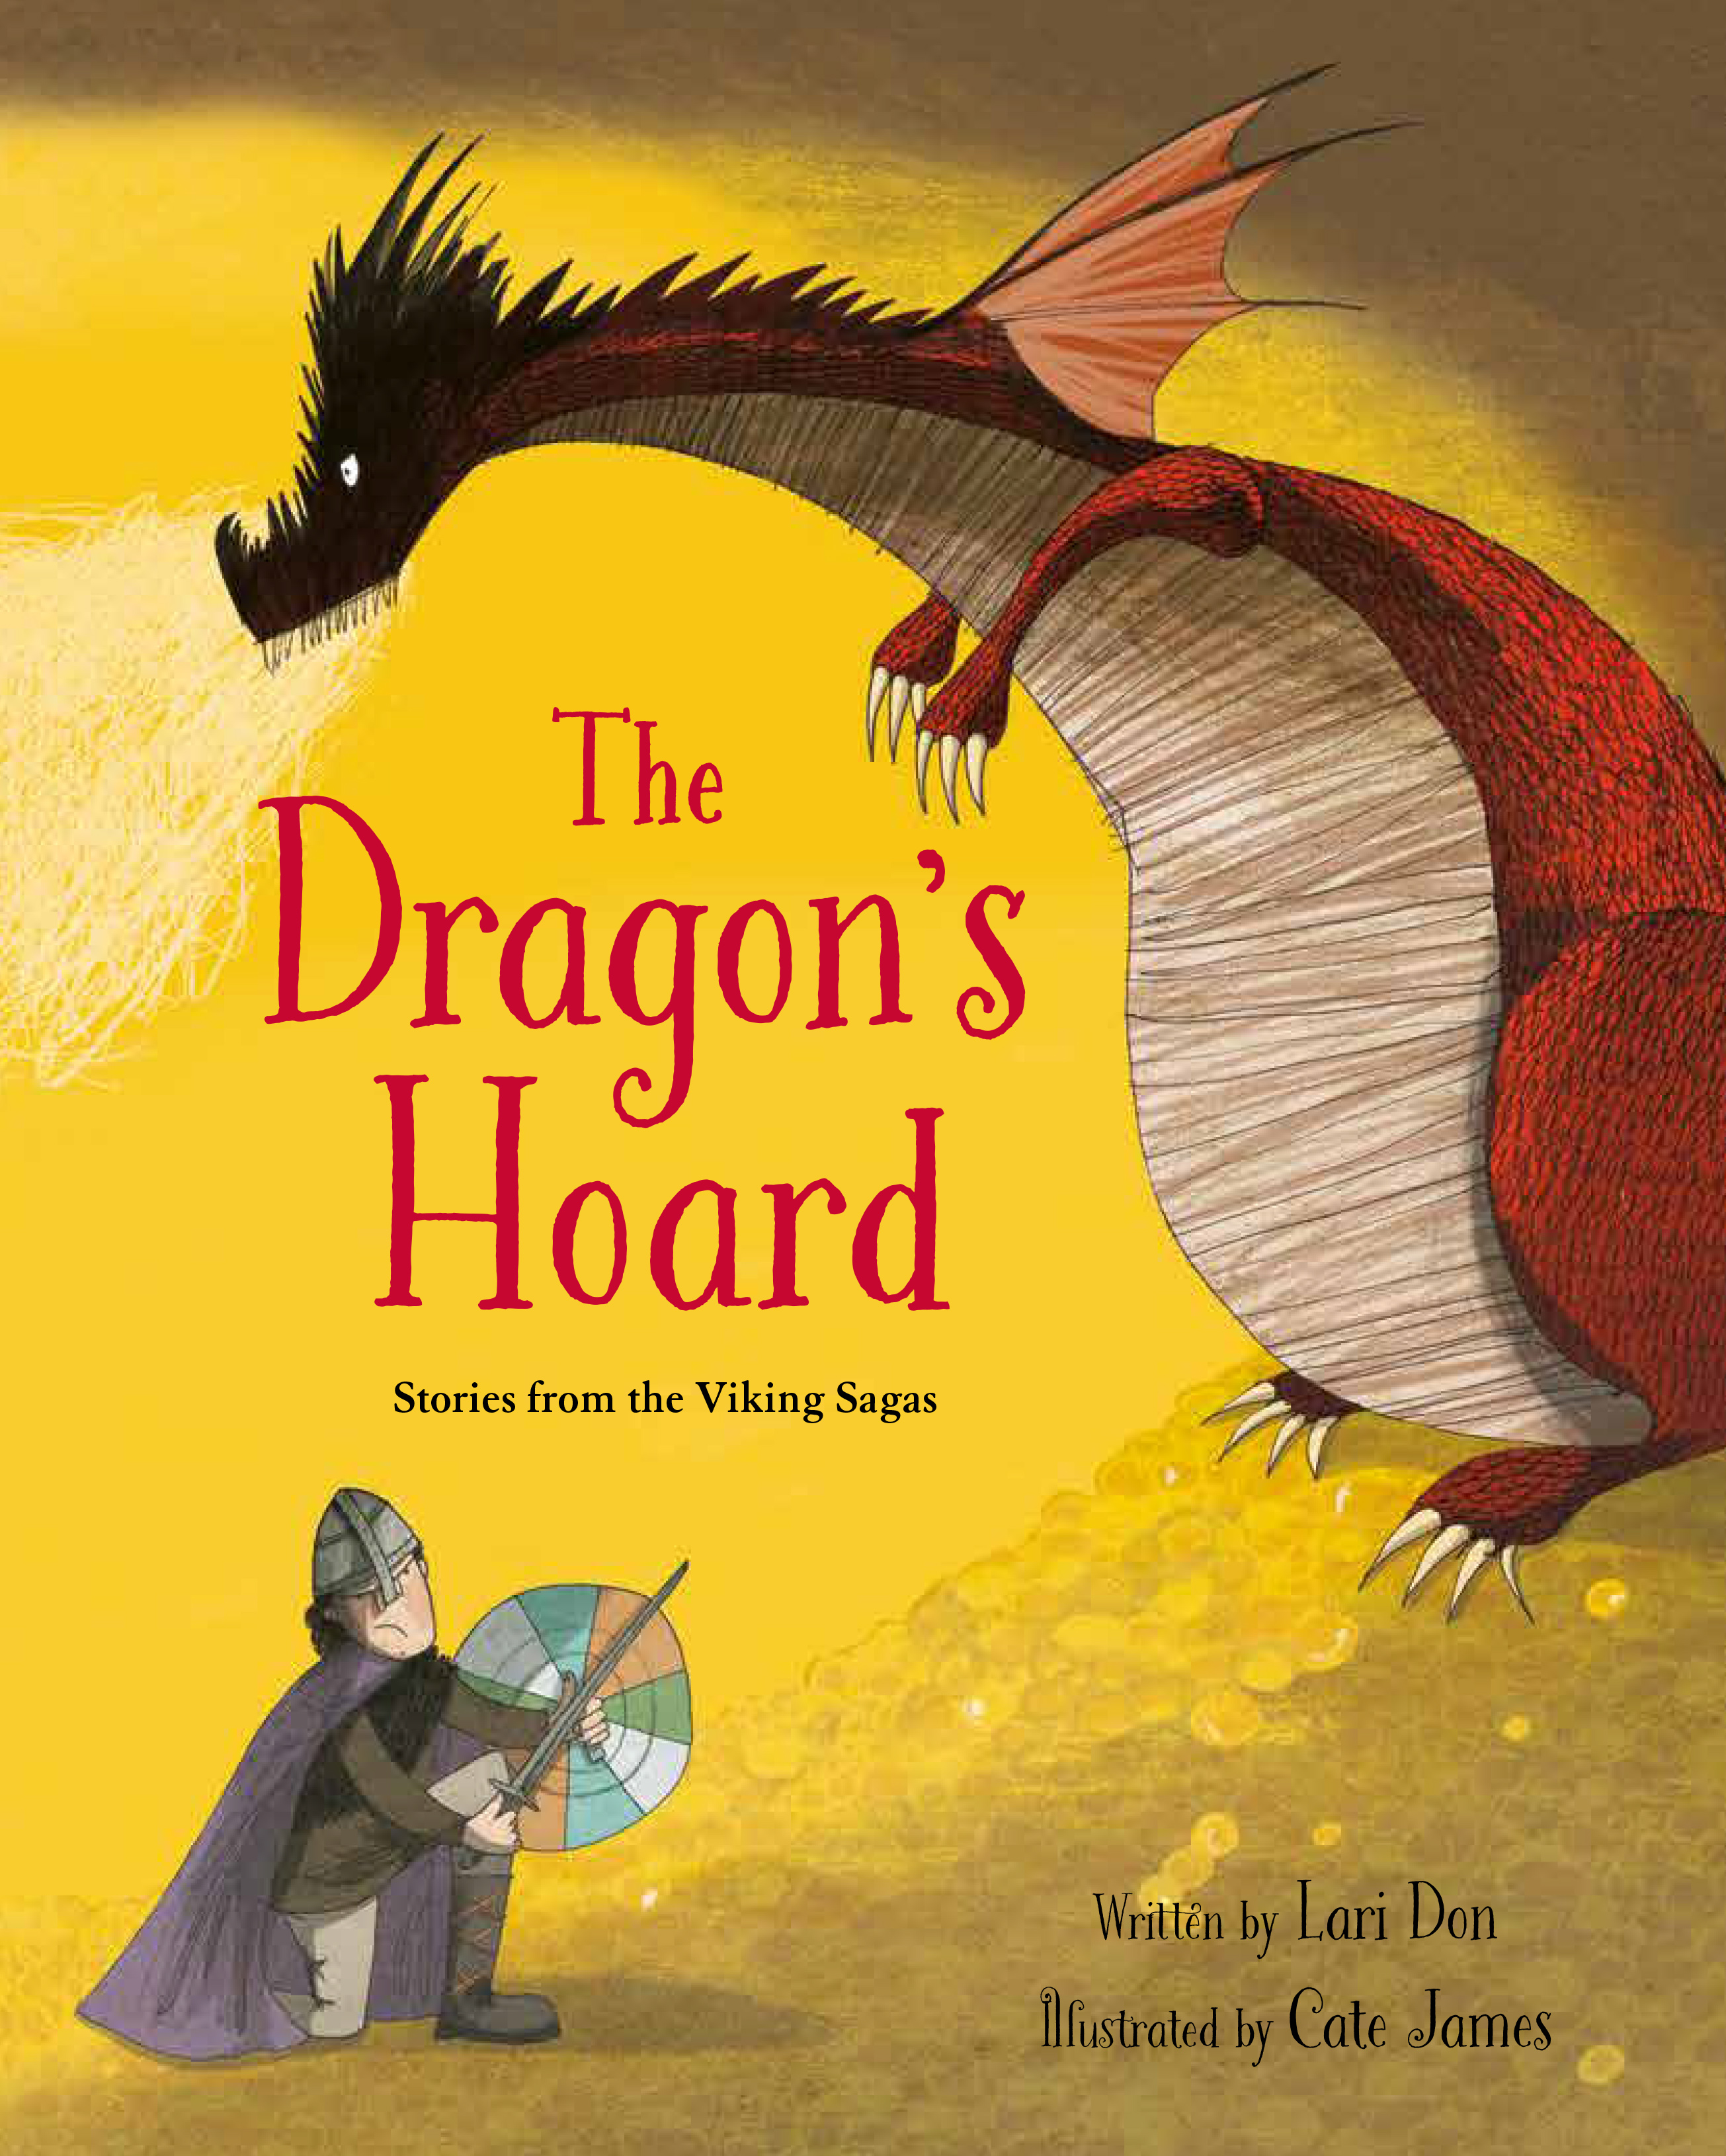 The Dragon's Hoard – retellings of Viking Saga tales © Cate James (Frances Lincoln, Quarto Books)